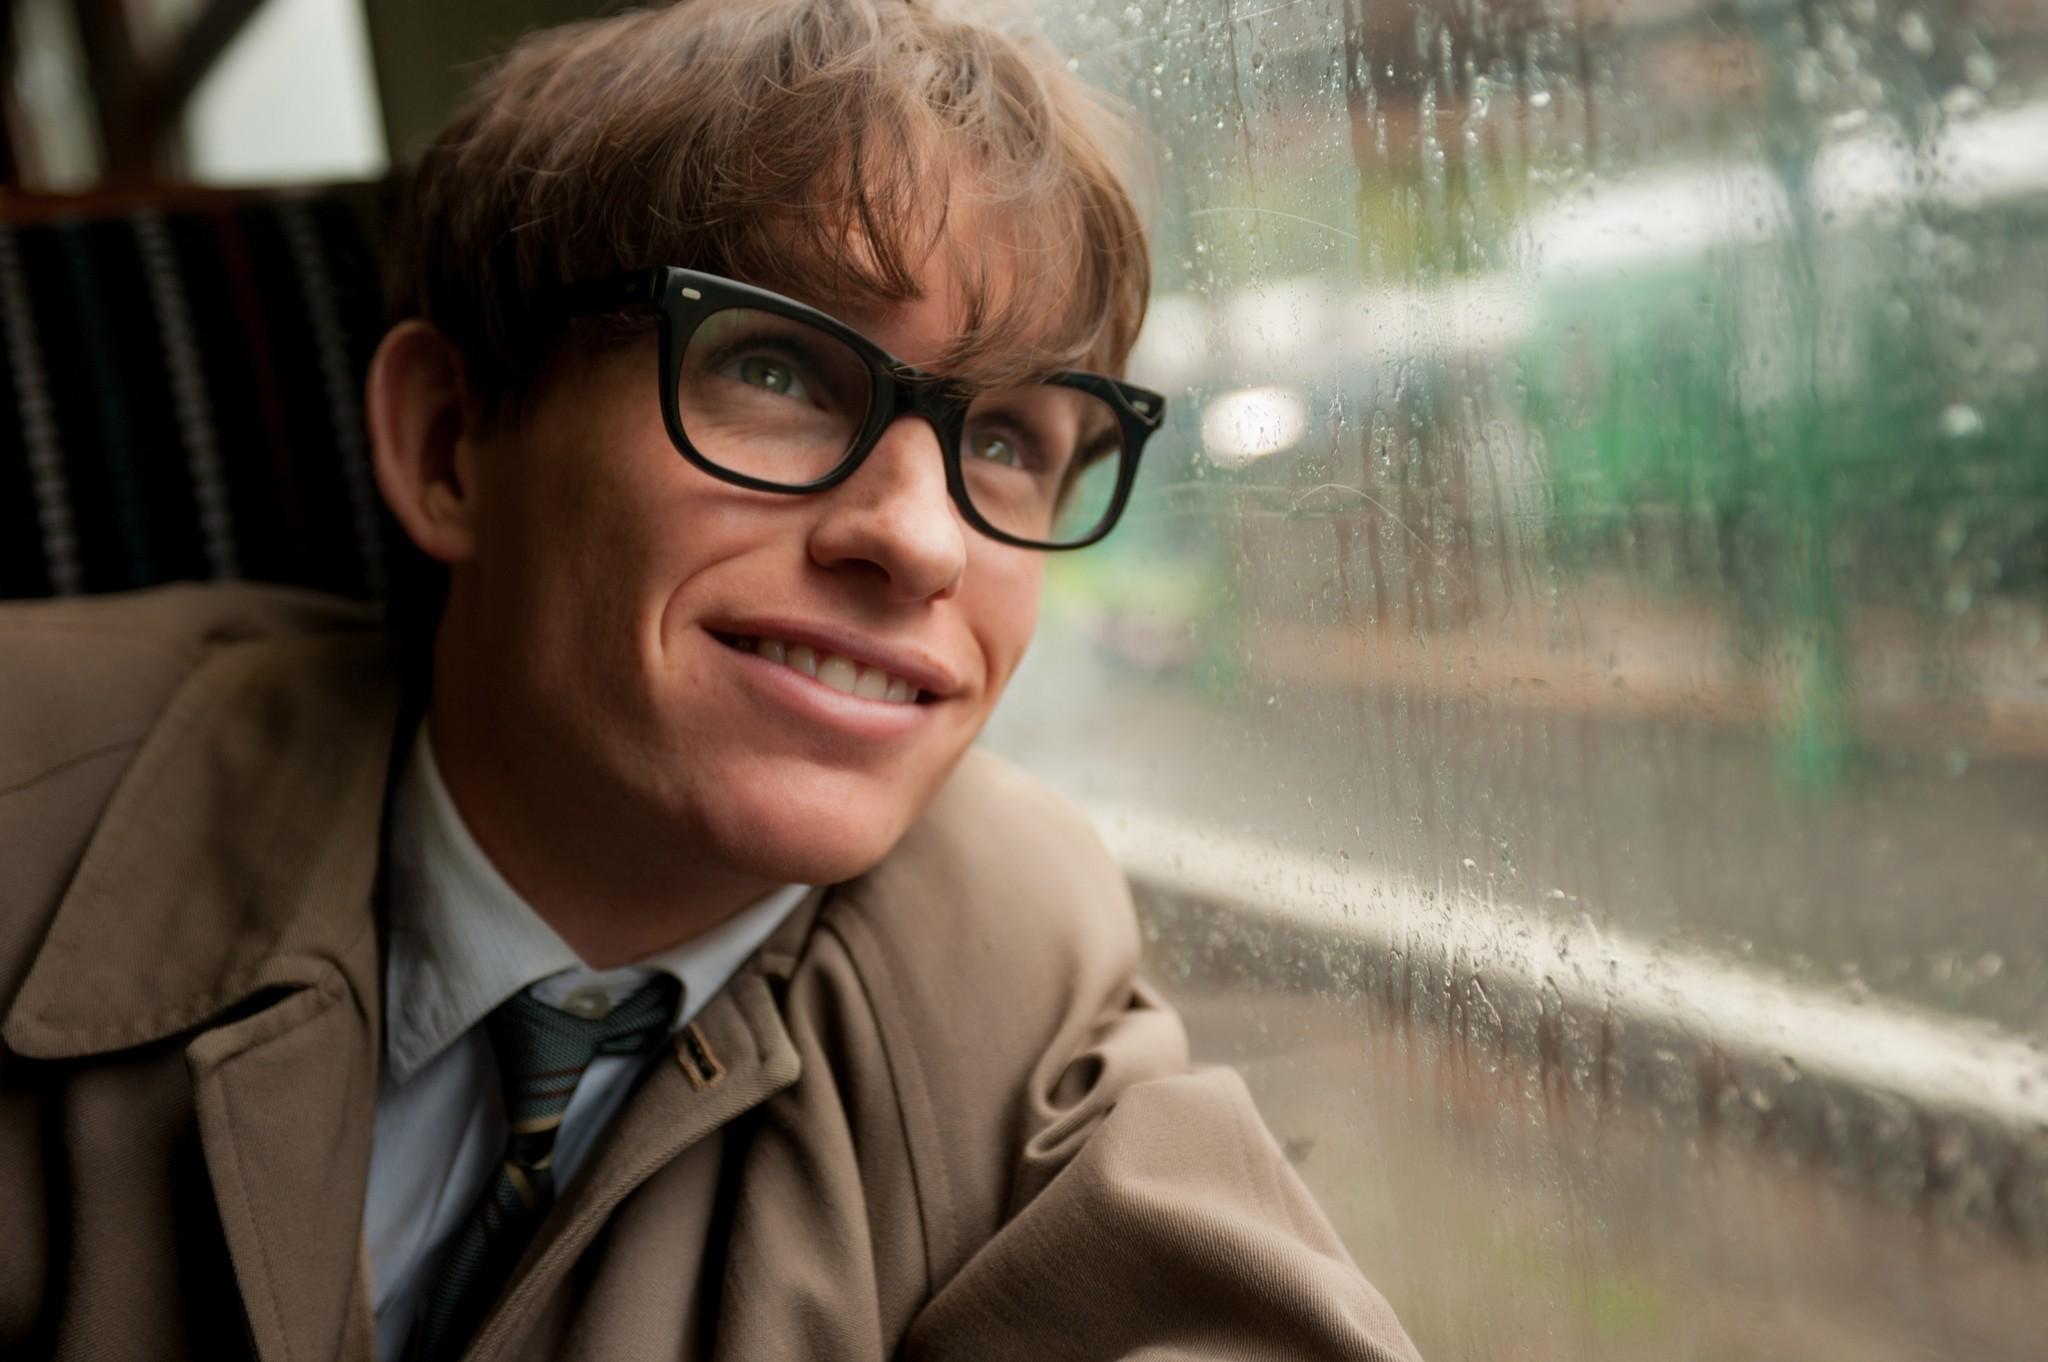 Stephen Hawking Dies at 76 His Mind Roamed the Cosmos